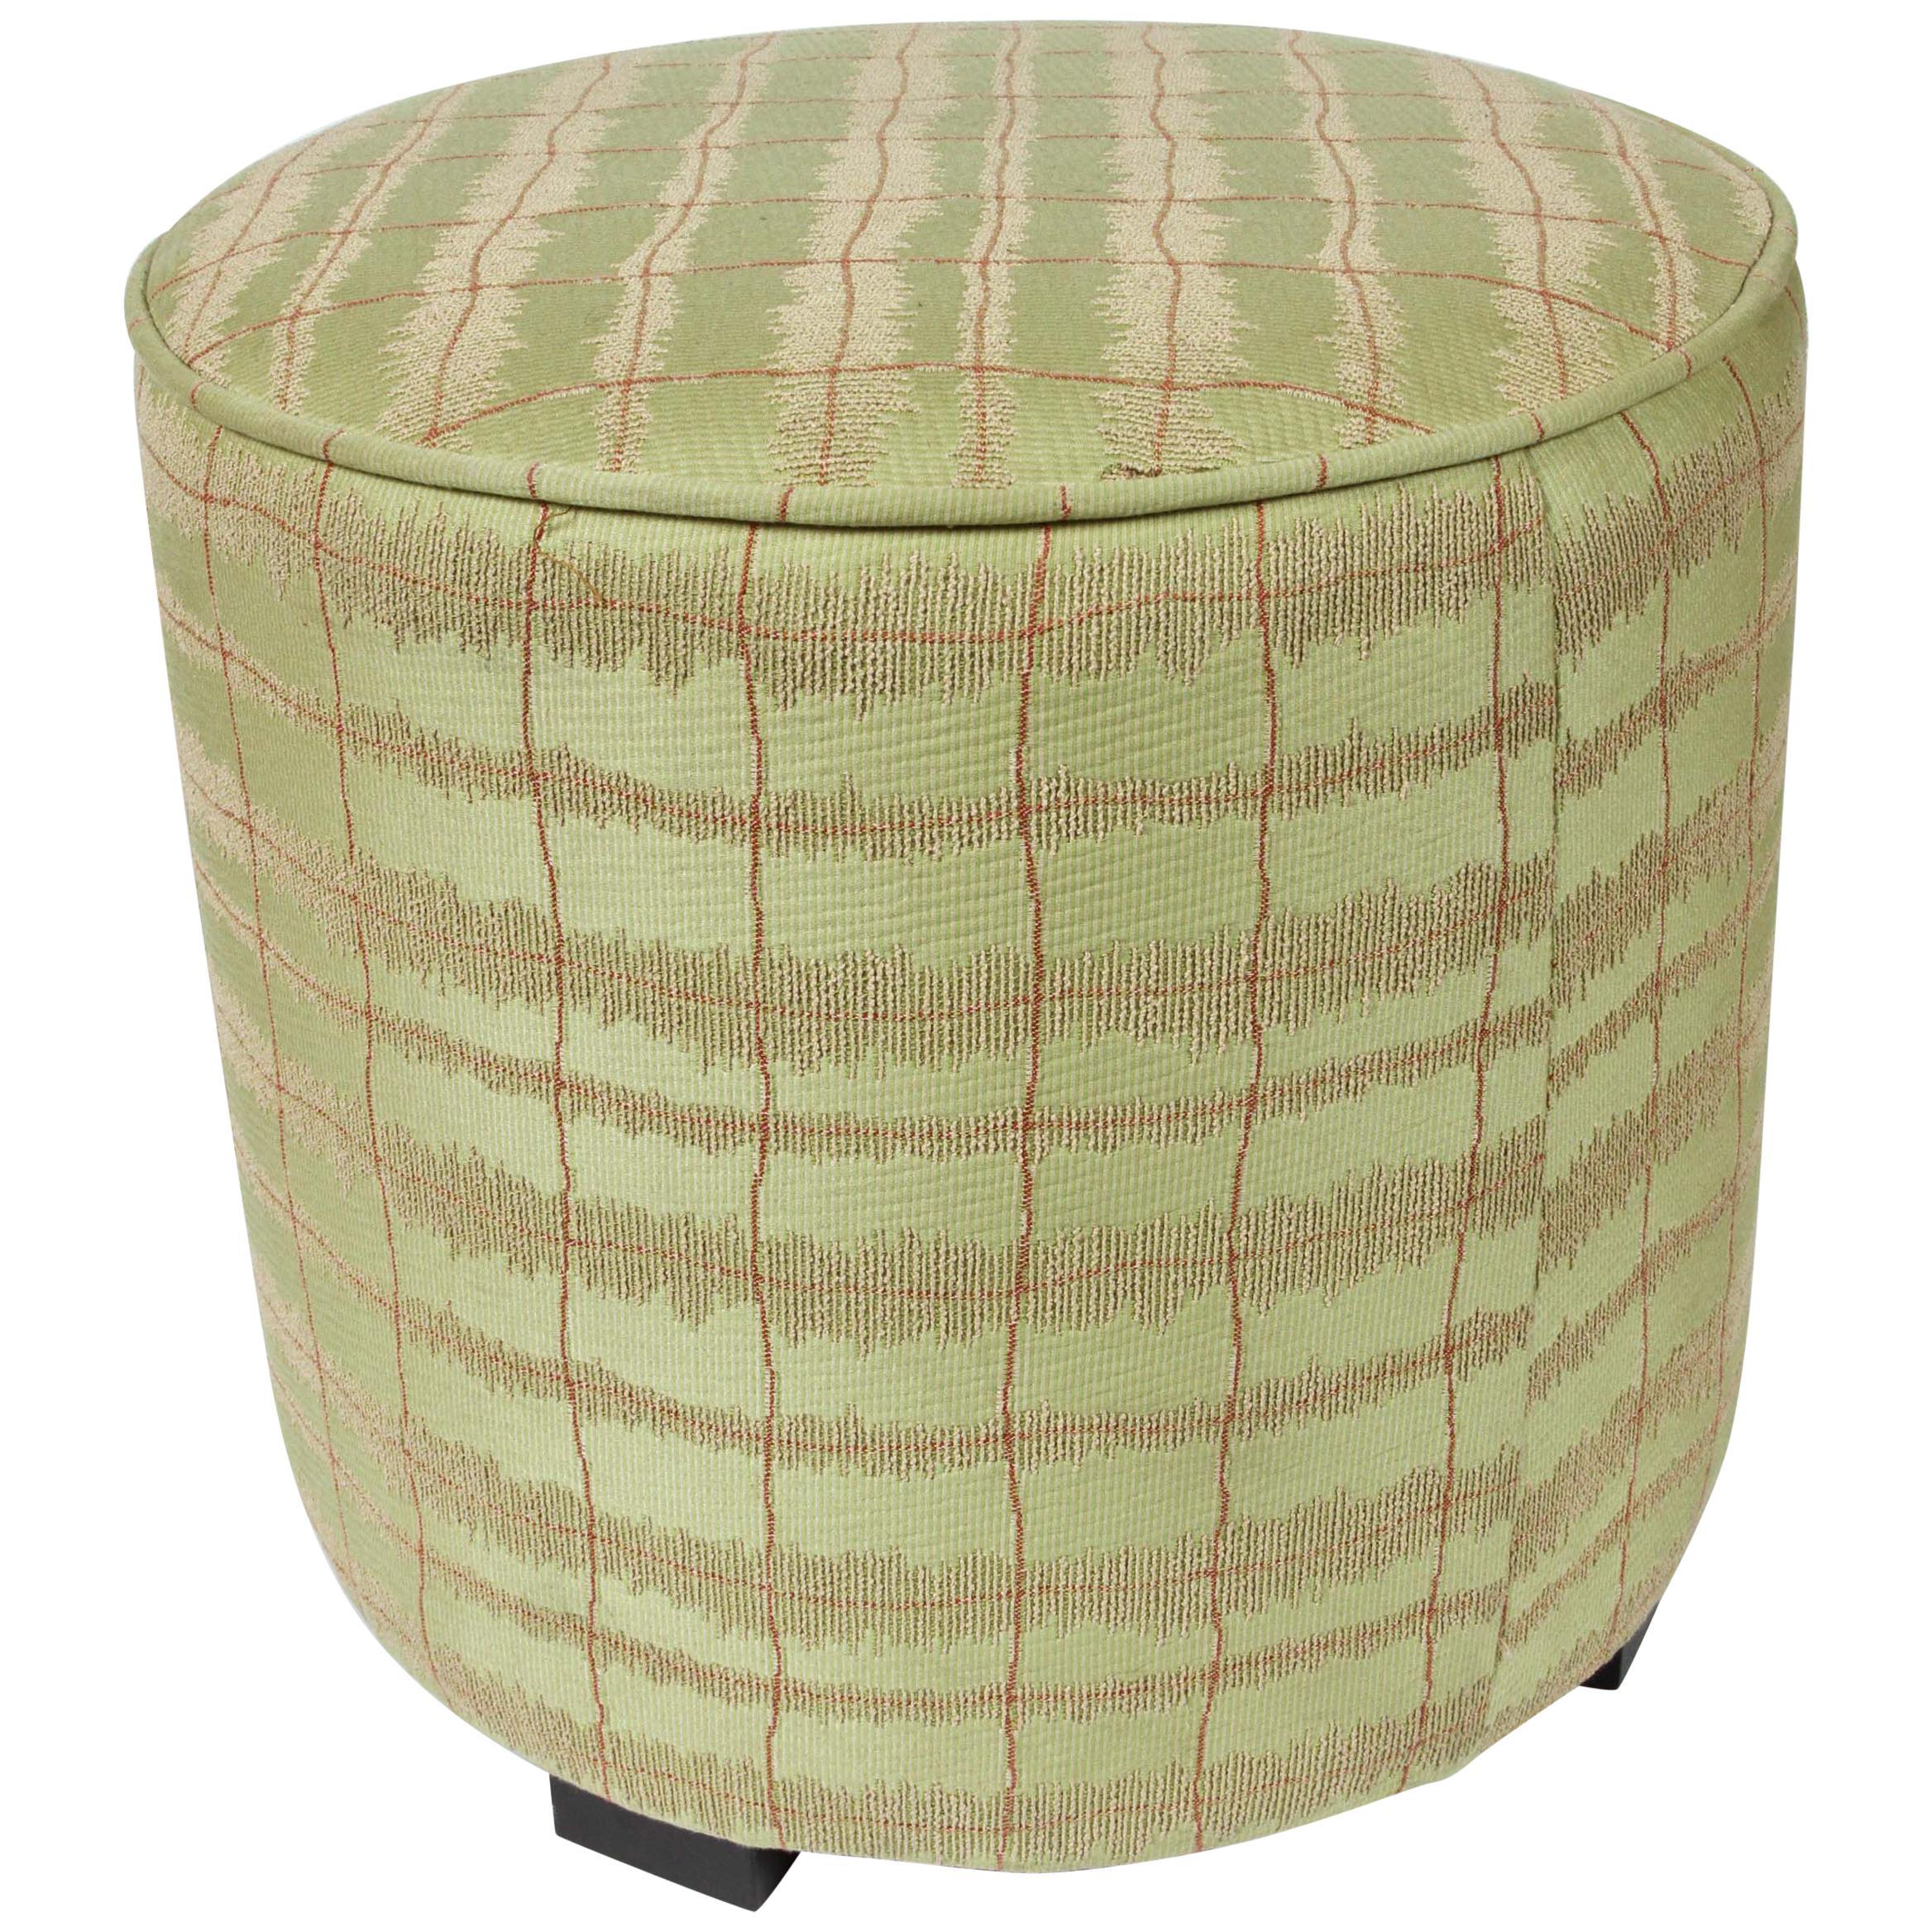 Enjoyable Modern Lime Green Round Moroccan Pouf Theyellowbook Wood Chair Design Ideas Theyellowbookinfo